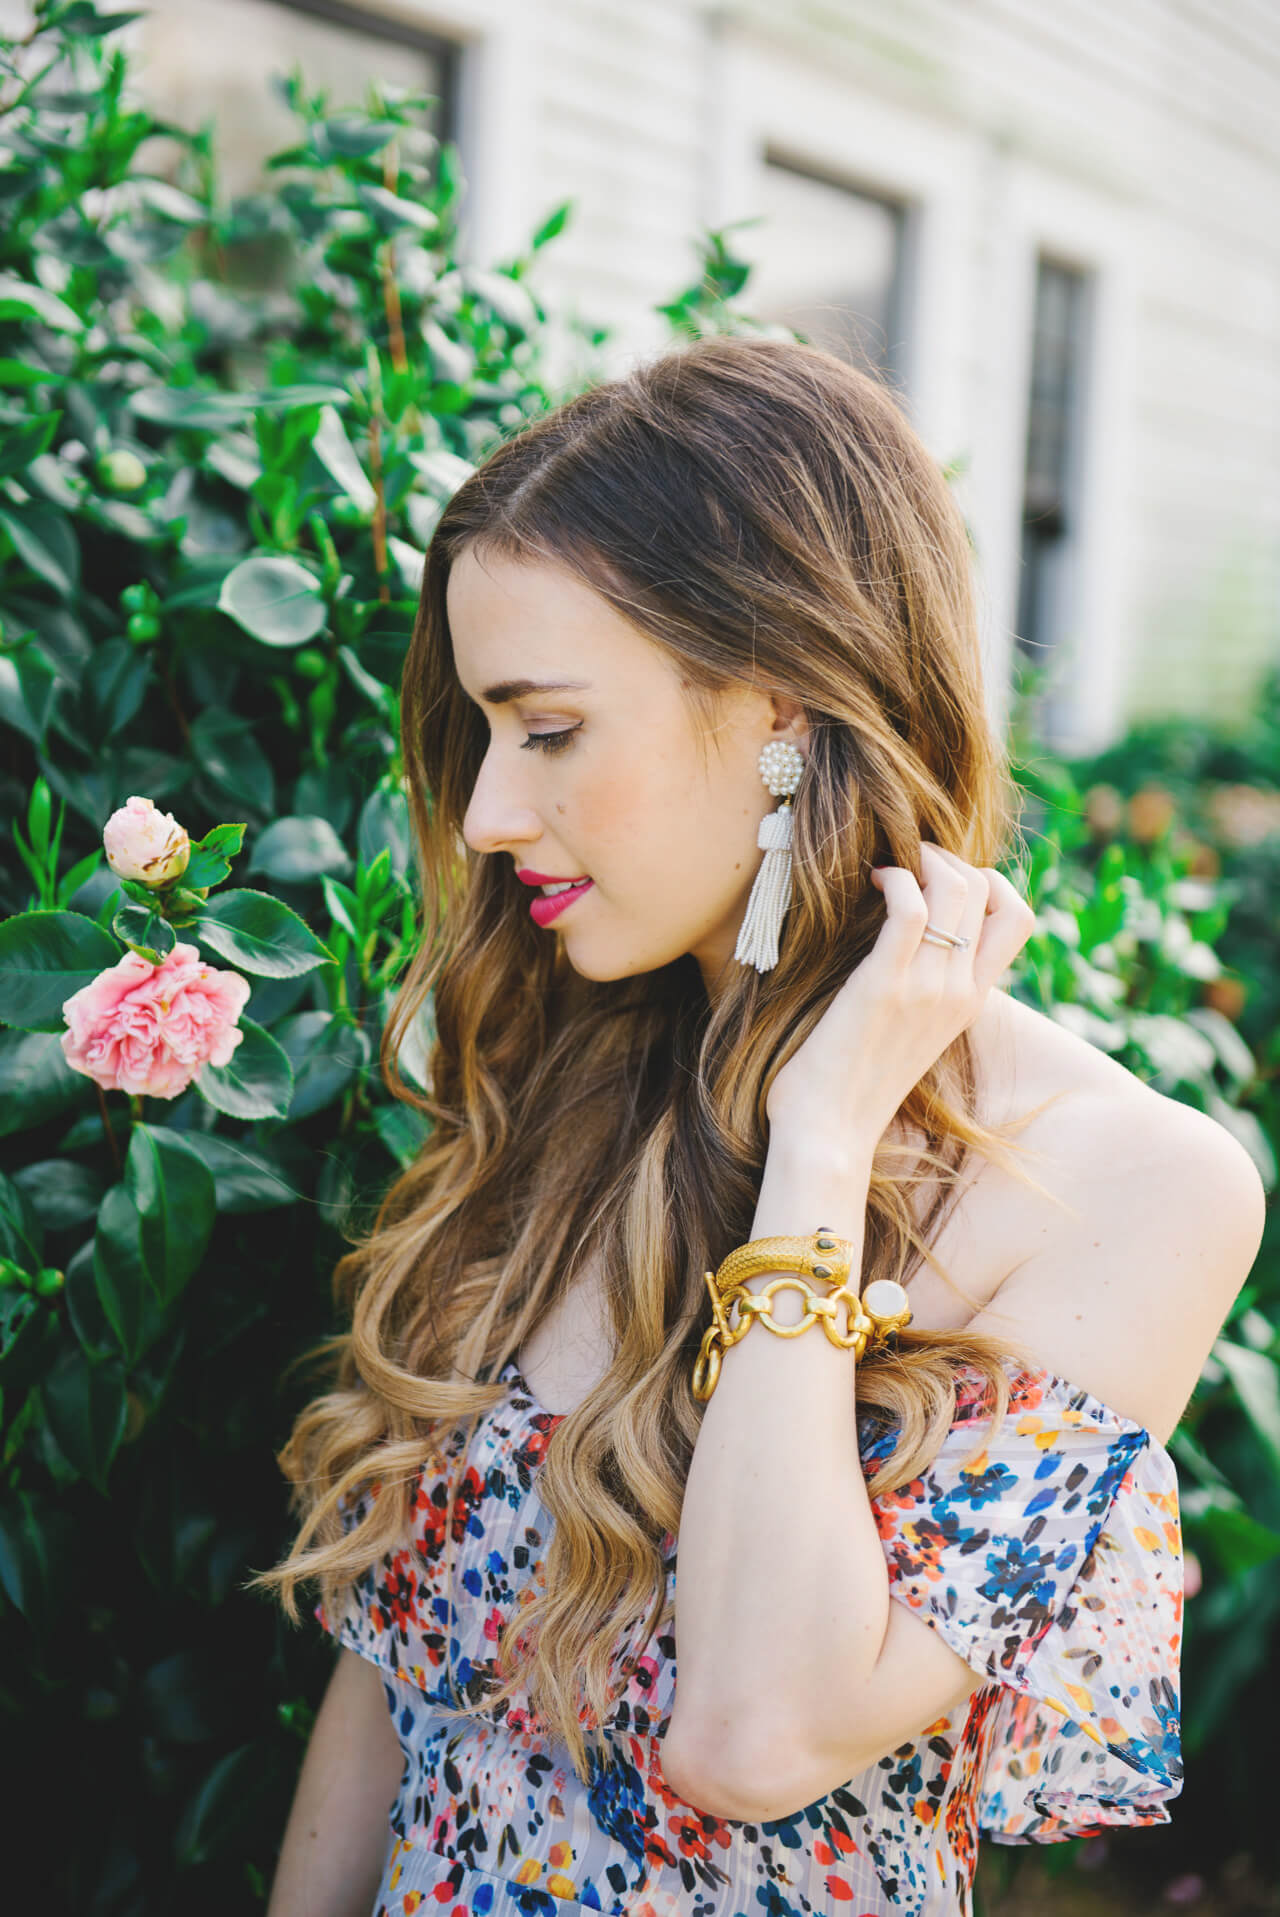 tassel earrings with floral dress